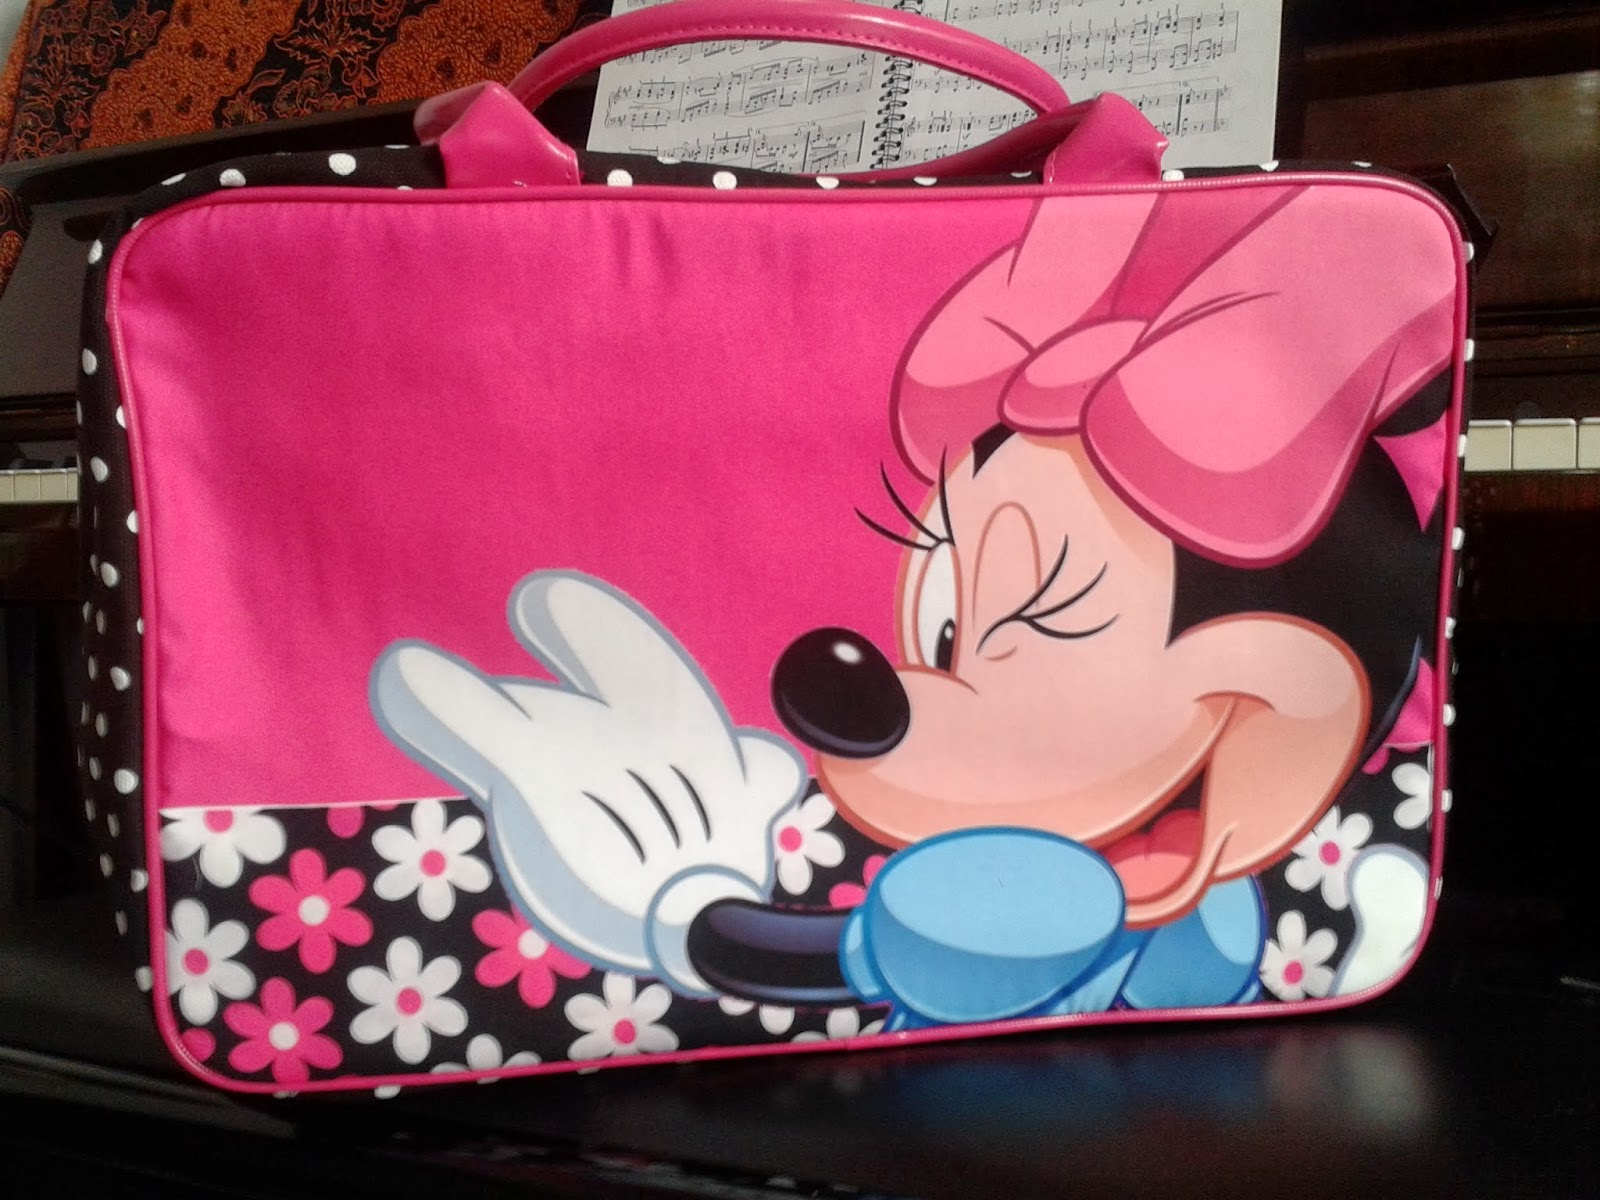 Jual Tas Travel Bag Anak Murah Minnie Mouse Grosir Tas Travel Bag